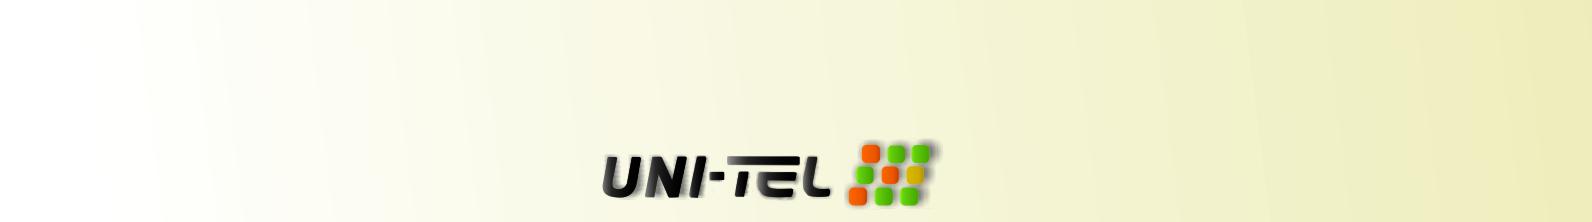 UNI-TEL Website Banner